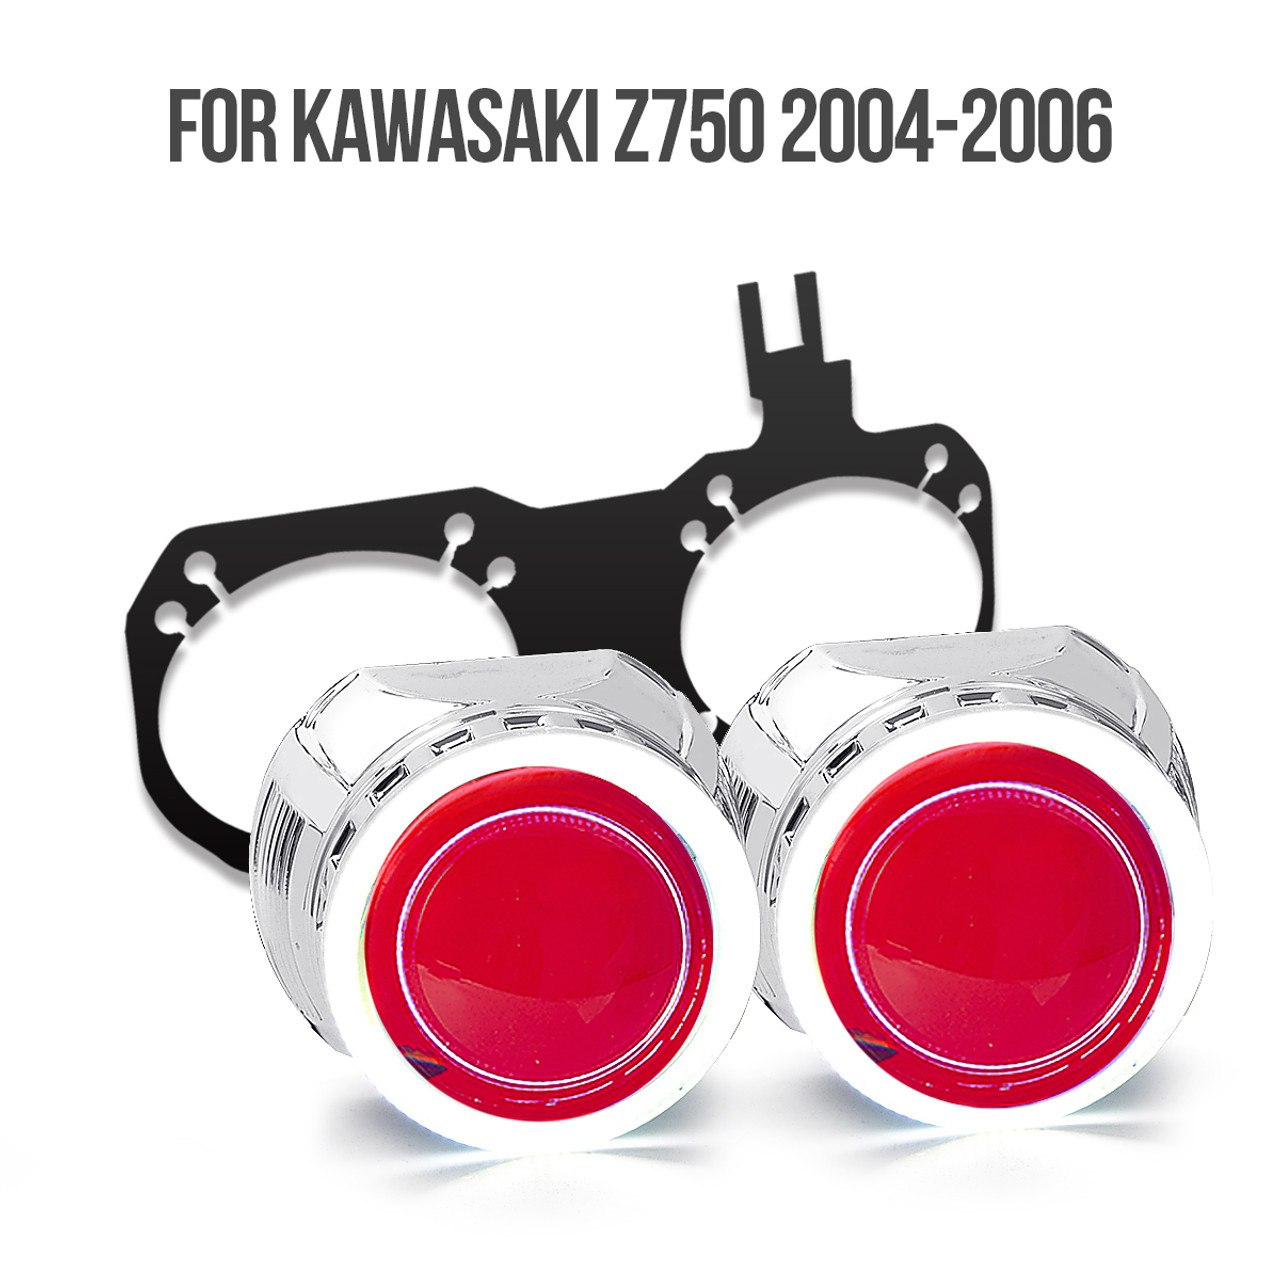 medium resolution of 2004 kawasaki z750 hid projector kit